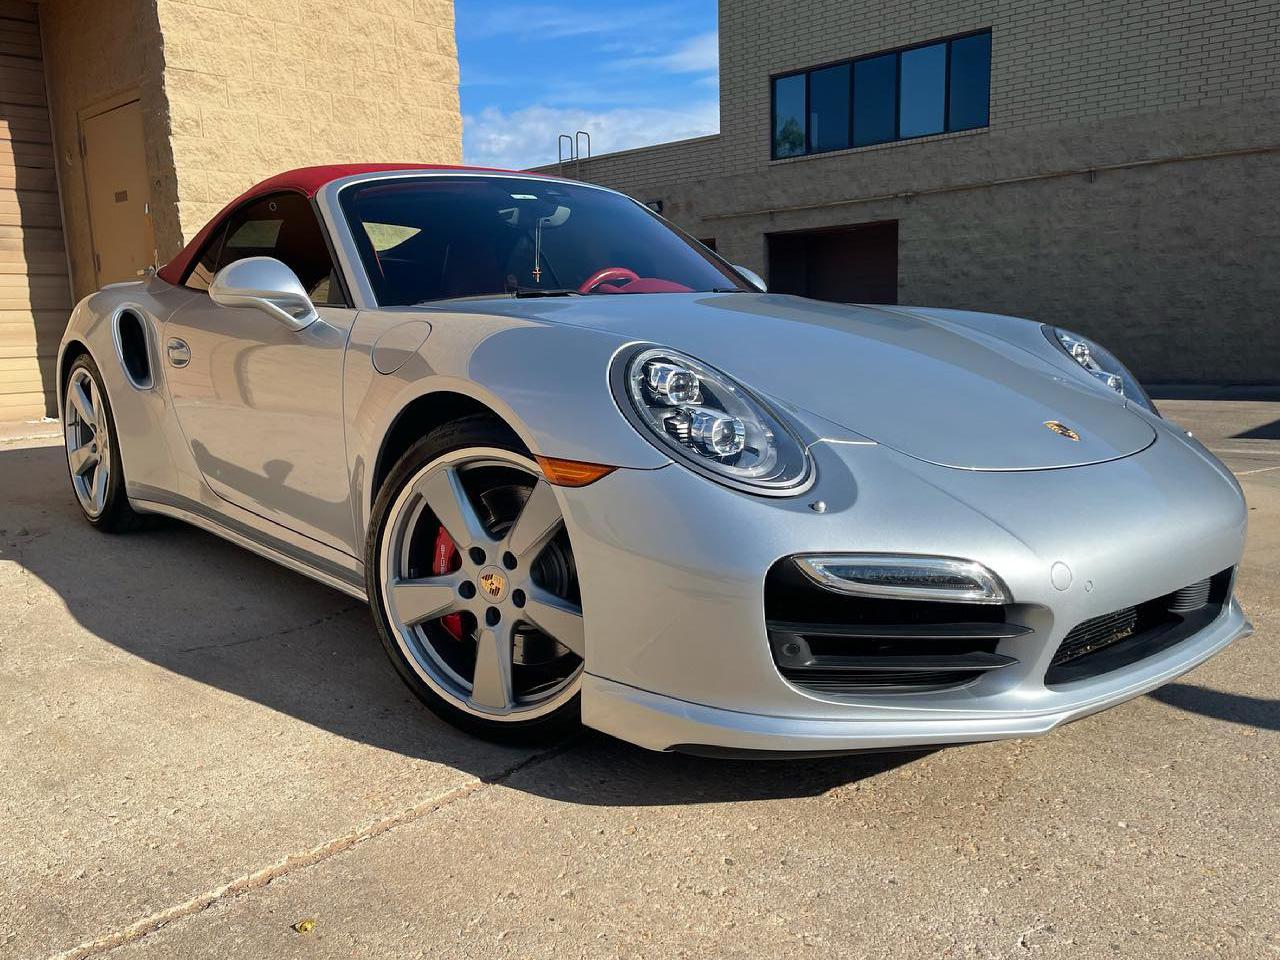 Porsche 911 Turbo ceramic coating